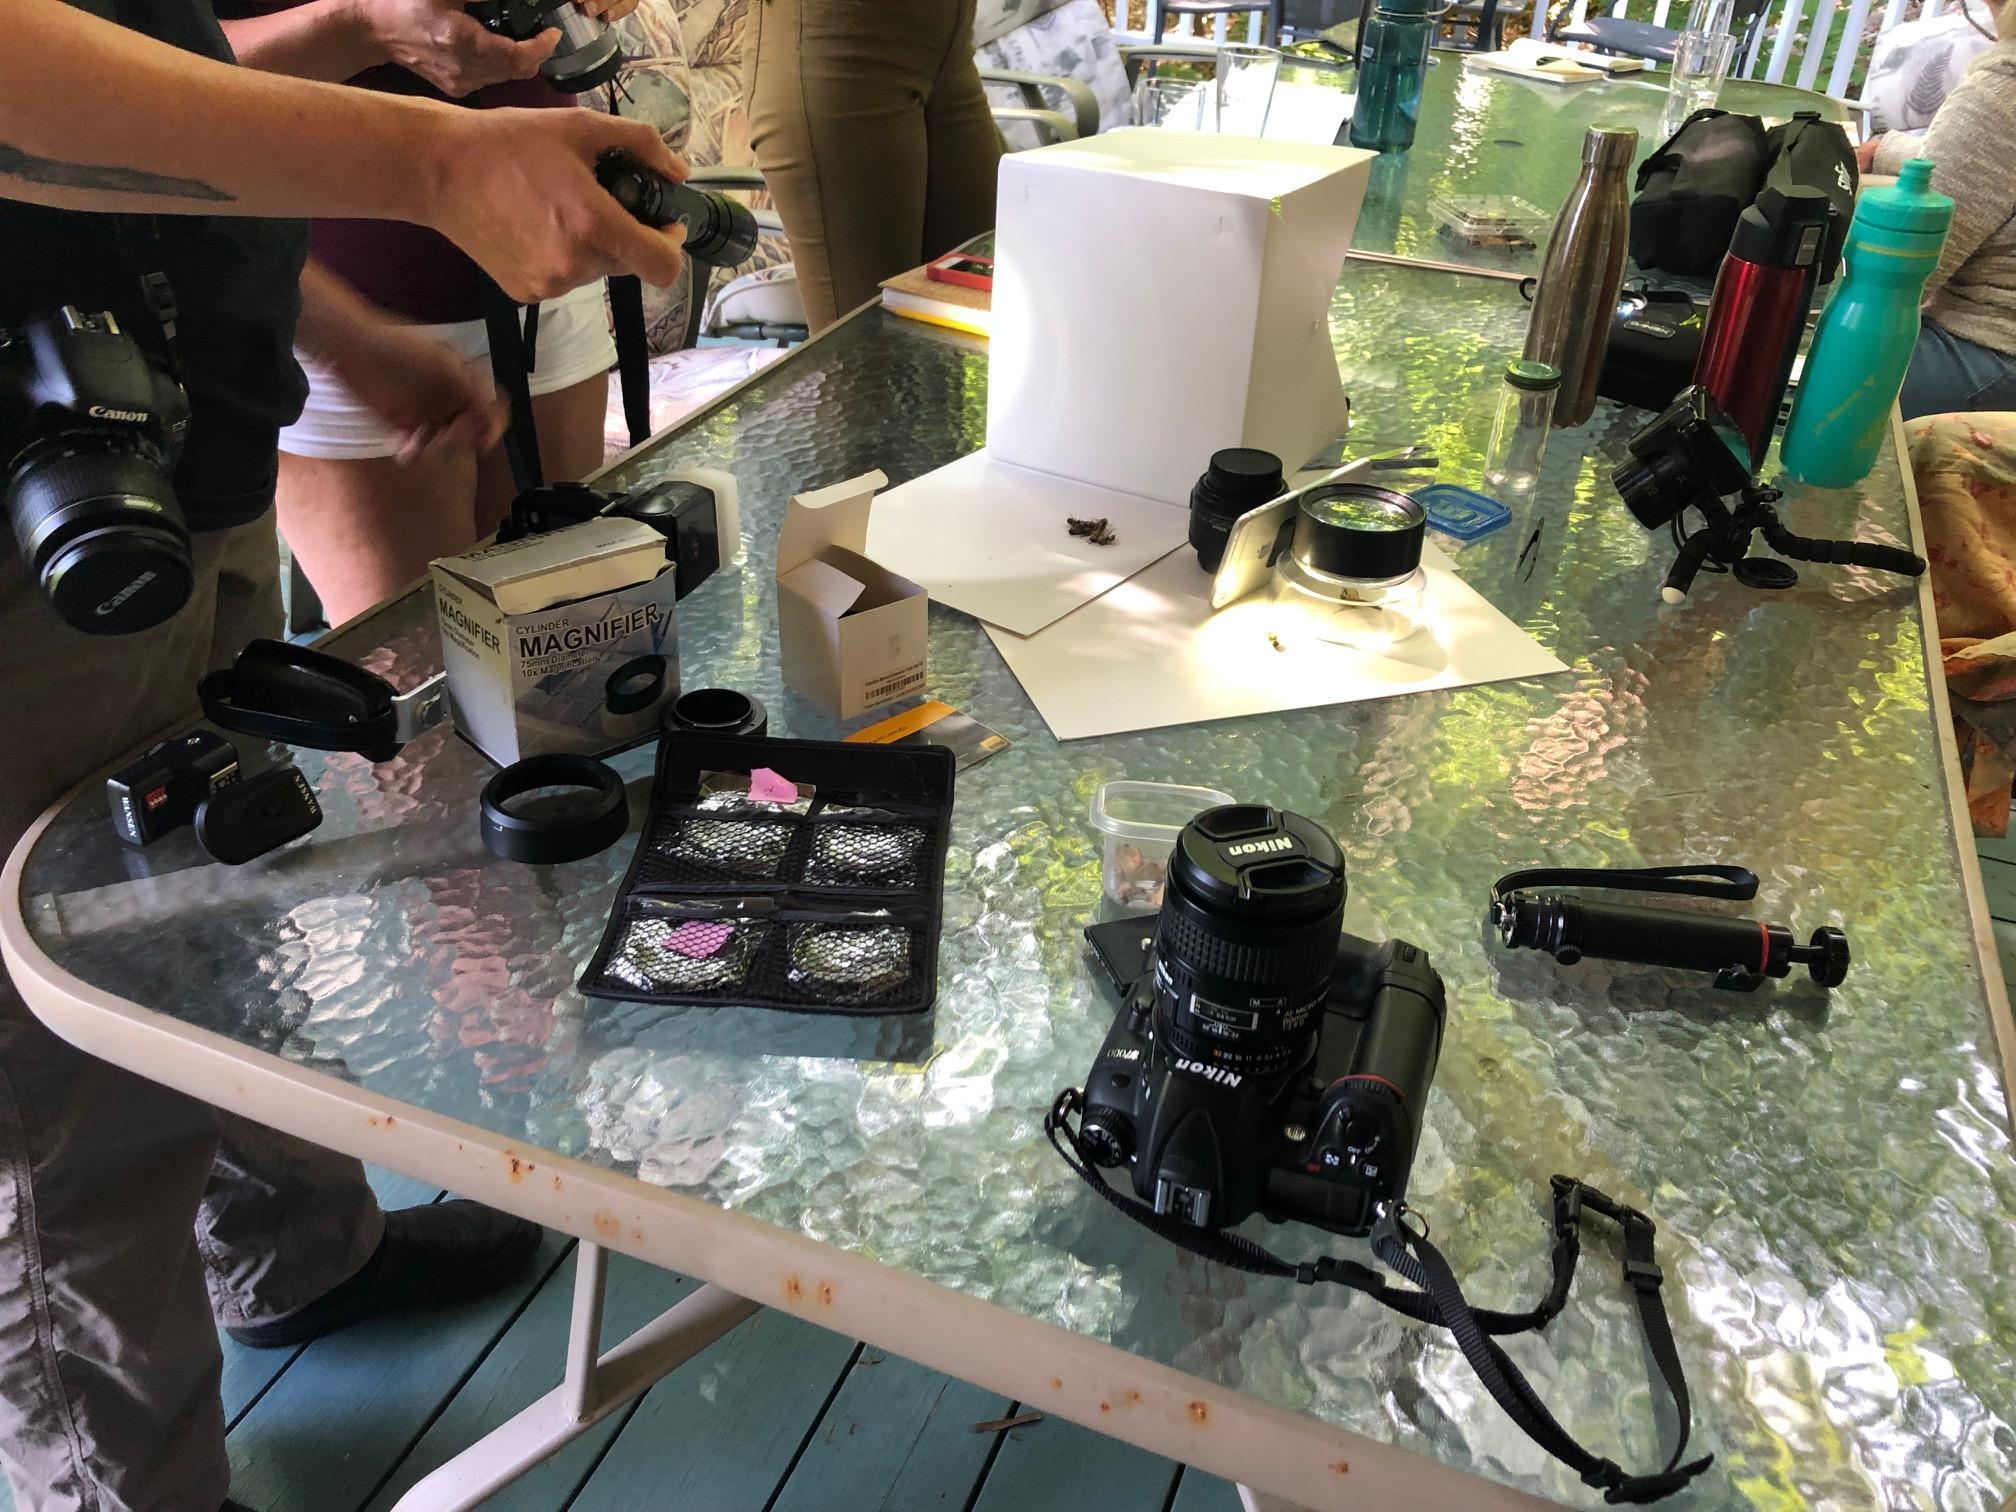 Macro equipment and photo shoot setups